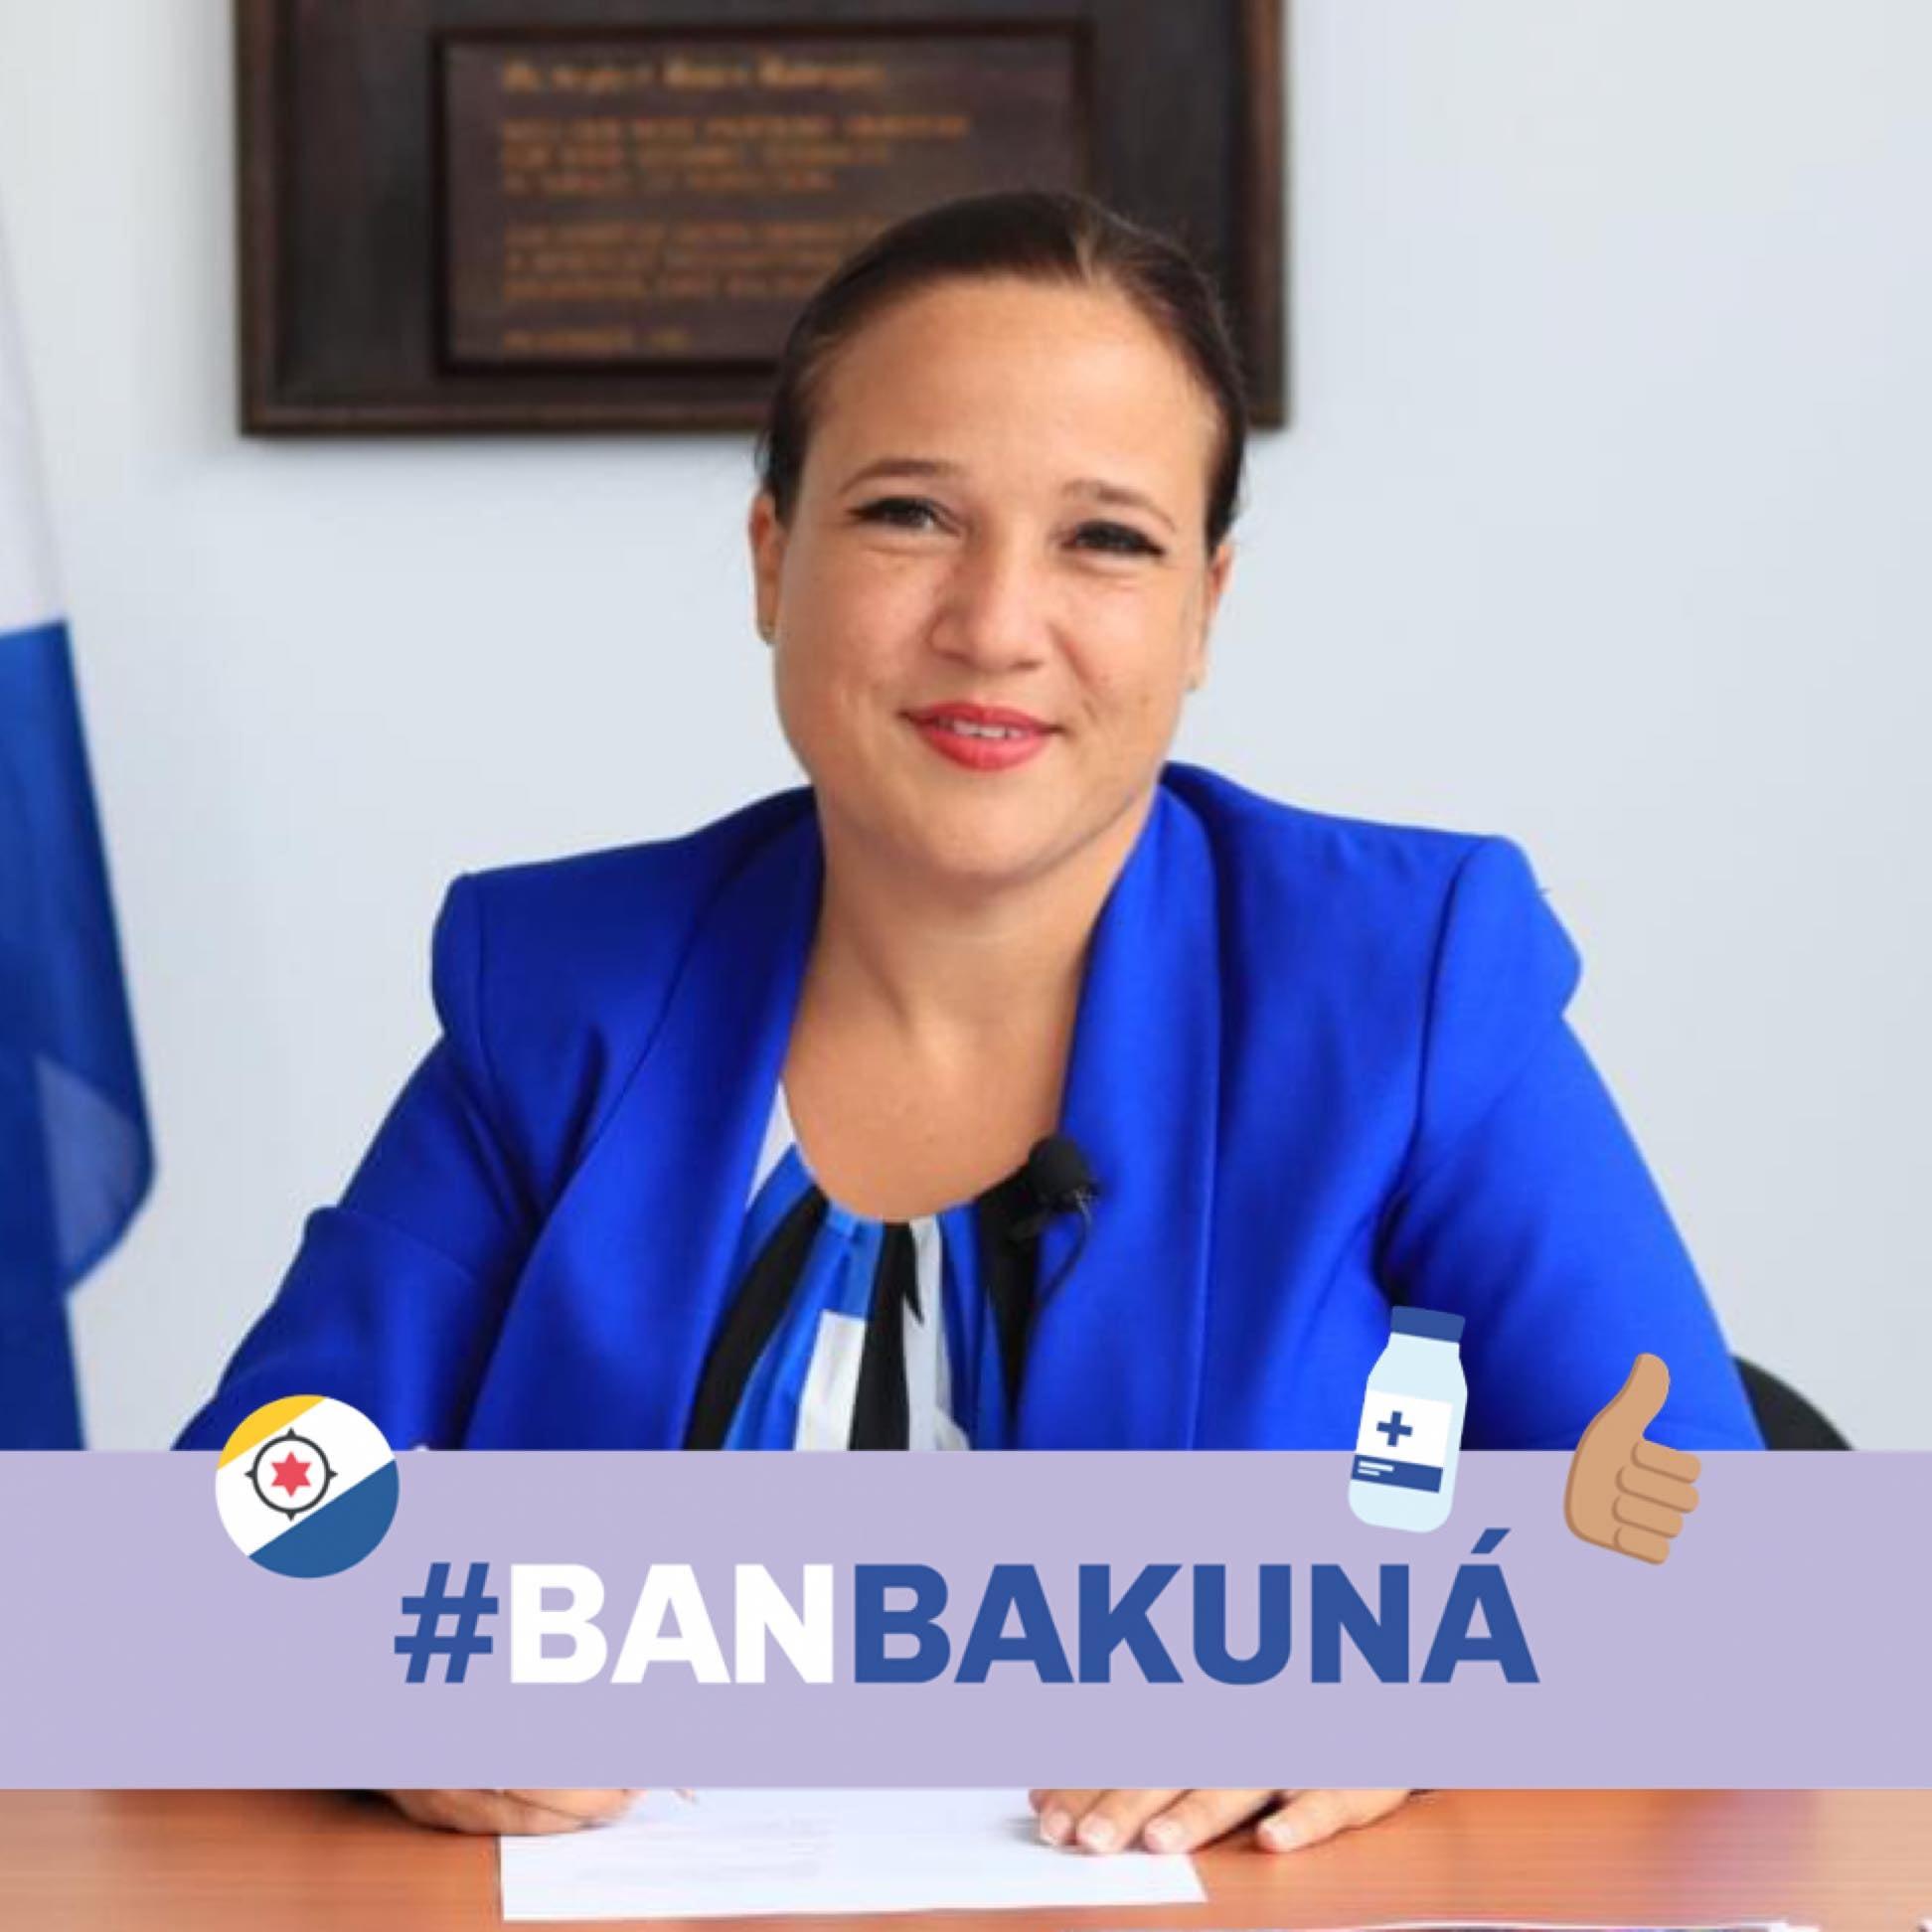 #BANBAKUNÁ I #BONBAKUNÁ AWOR KOMO KUADRO PA PROFILE PIC RIBA FACEBOOK